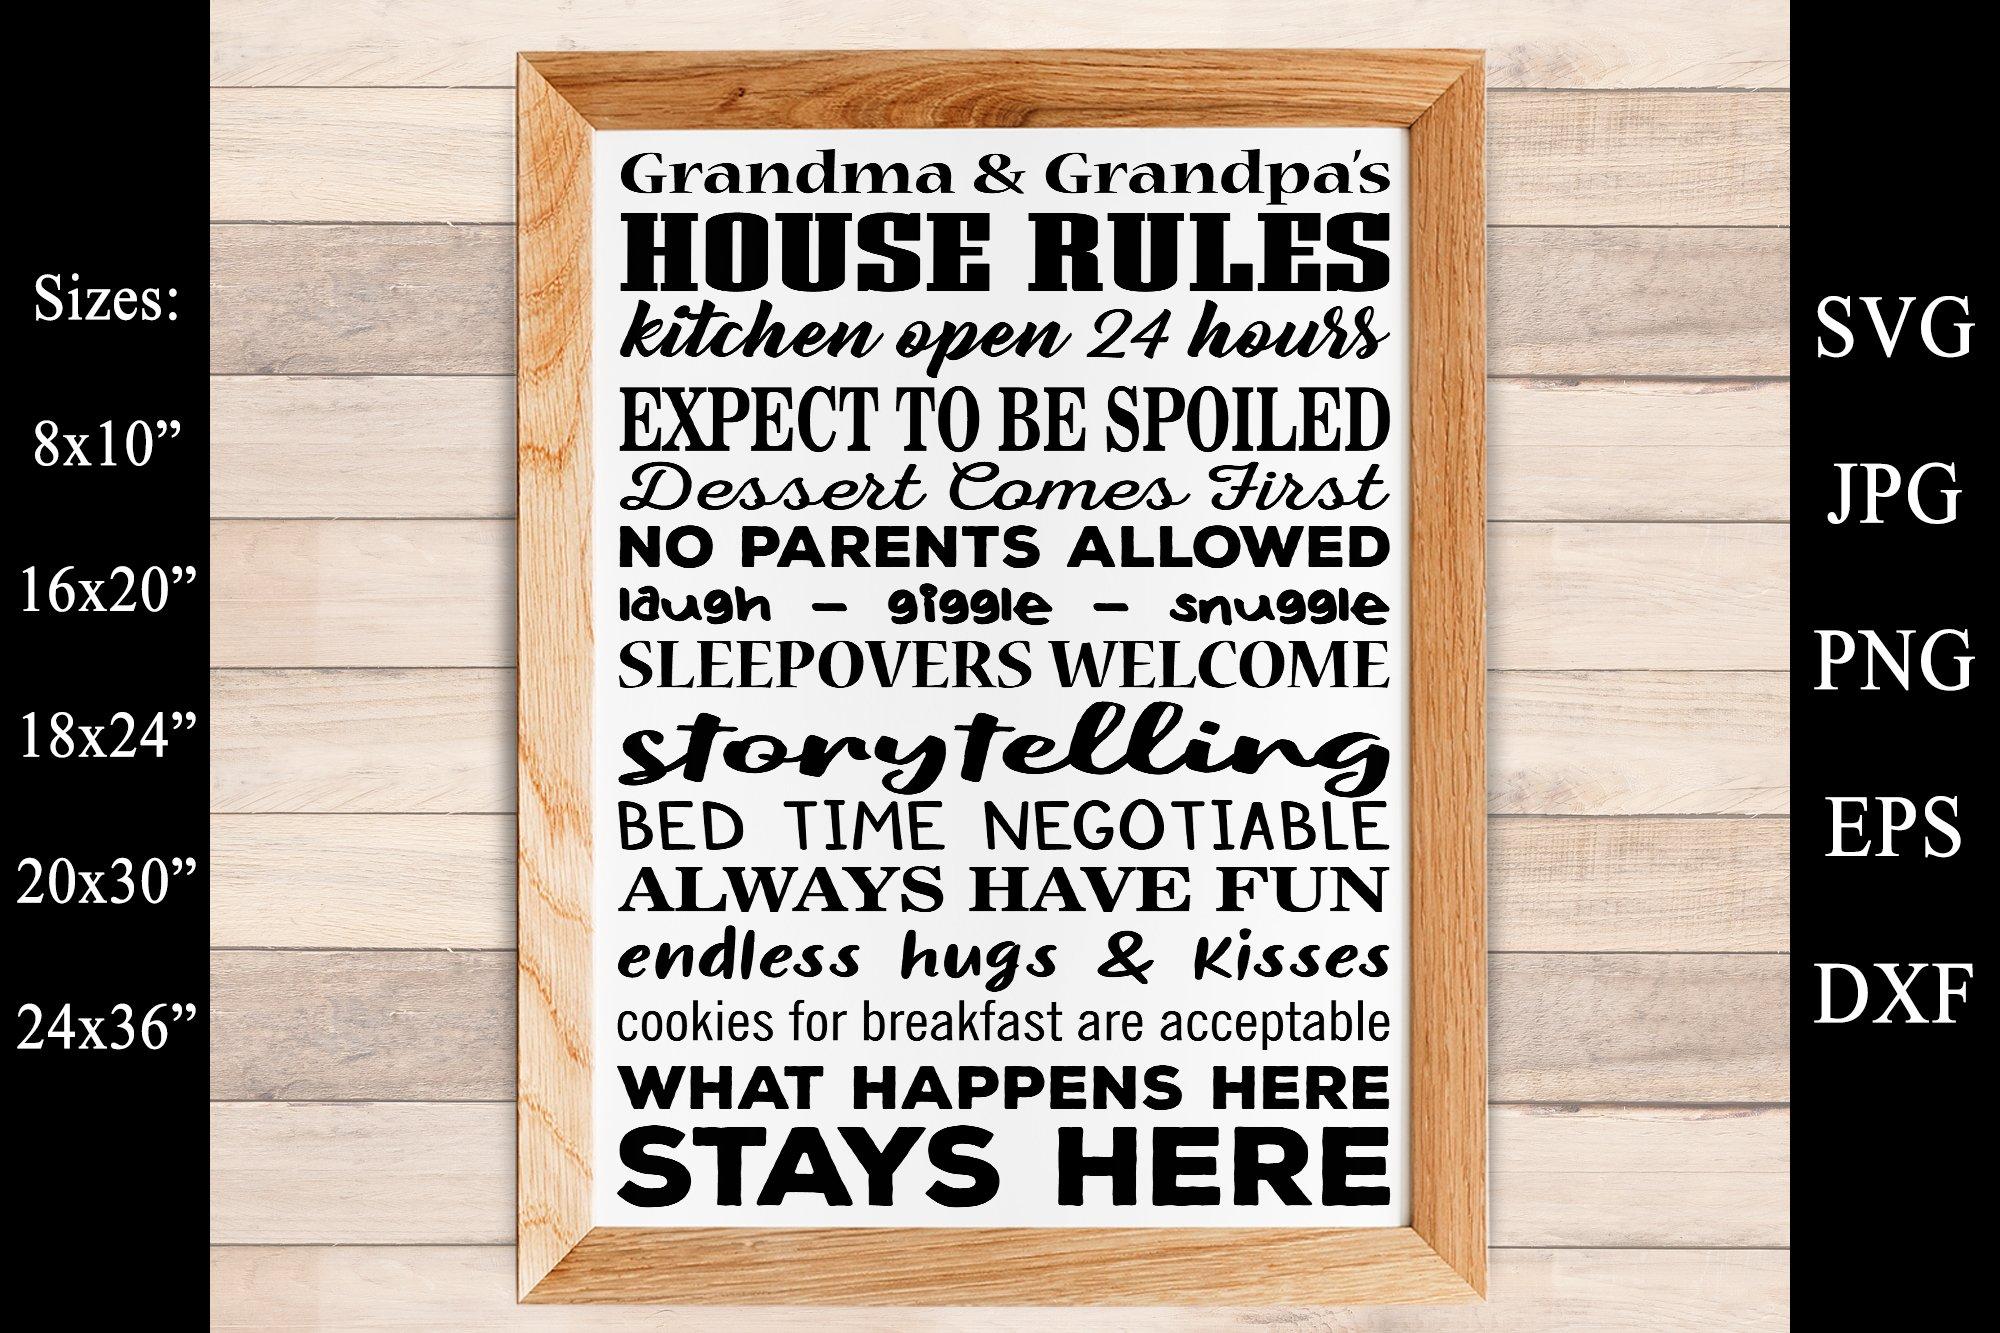 Grandma And Grandpas House Rules Camp Rules Svg Grandparents 419761 Svgs Design Bundles